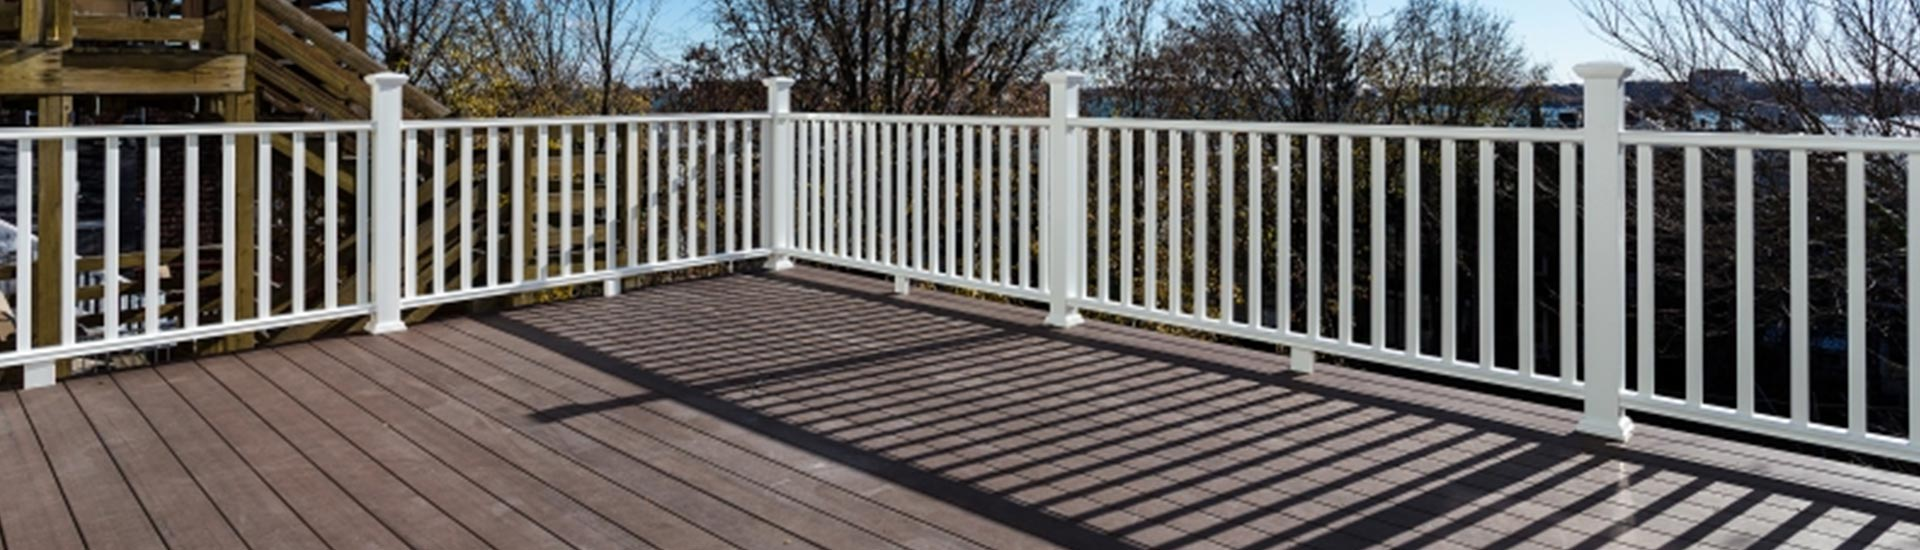 roof-deck-11